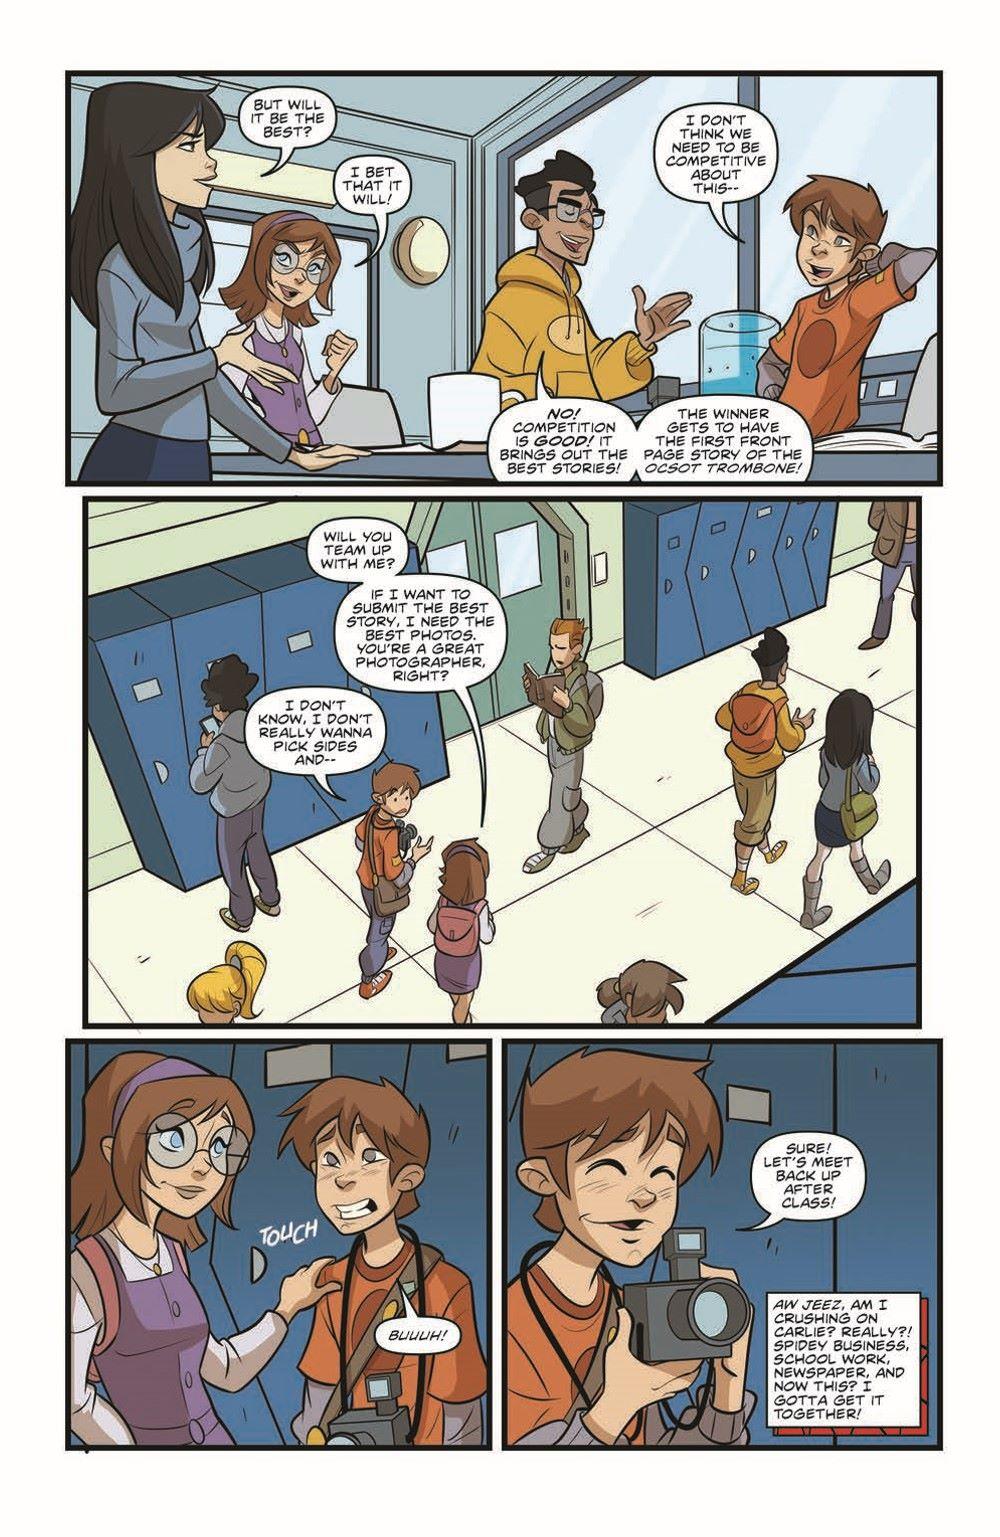 SpidermanV3-02_pr-7 ComicList Previews: MARVEL ACTION SPIDER-MAN VOLUME 3 #2